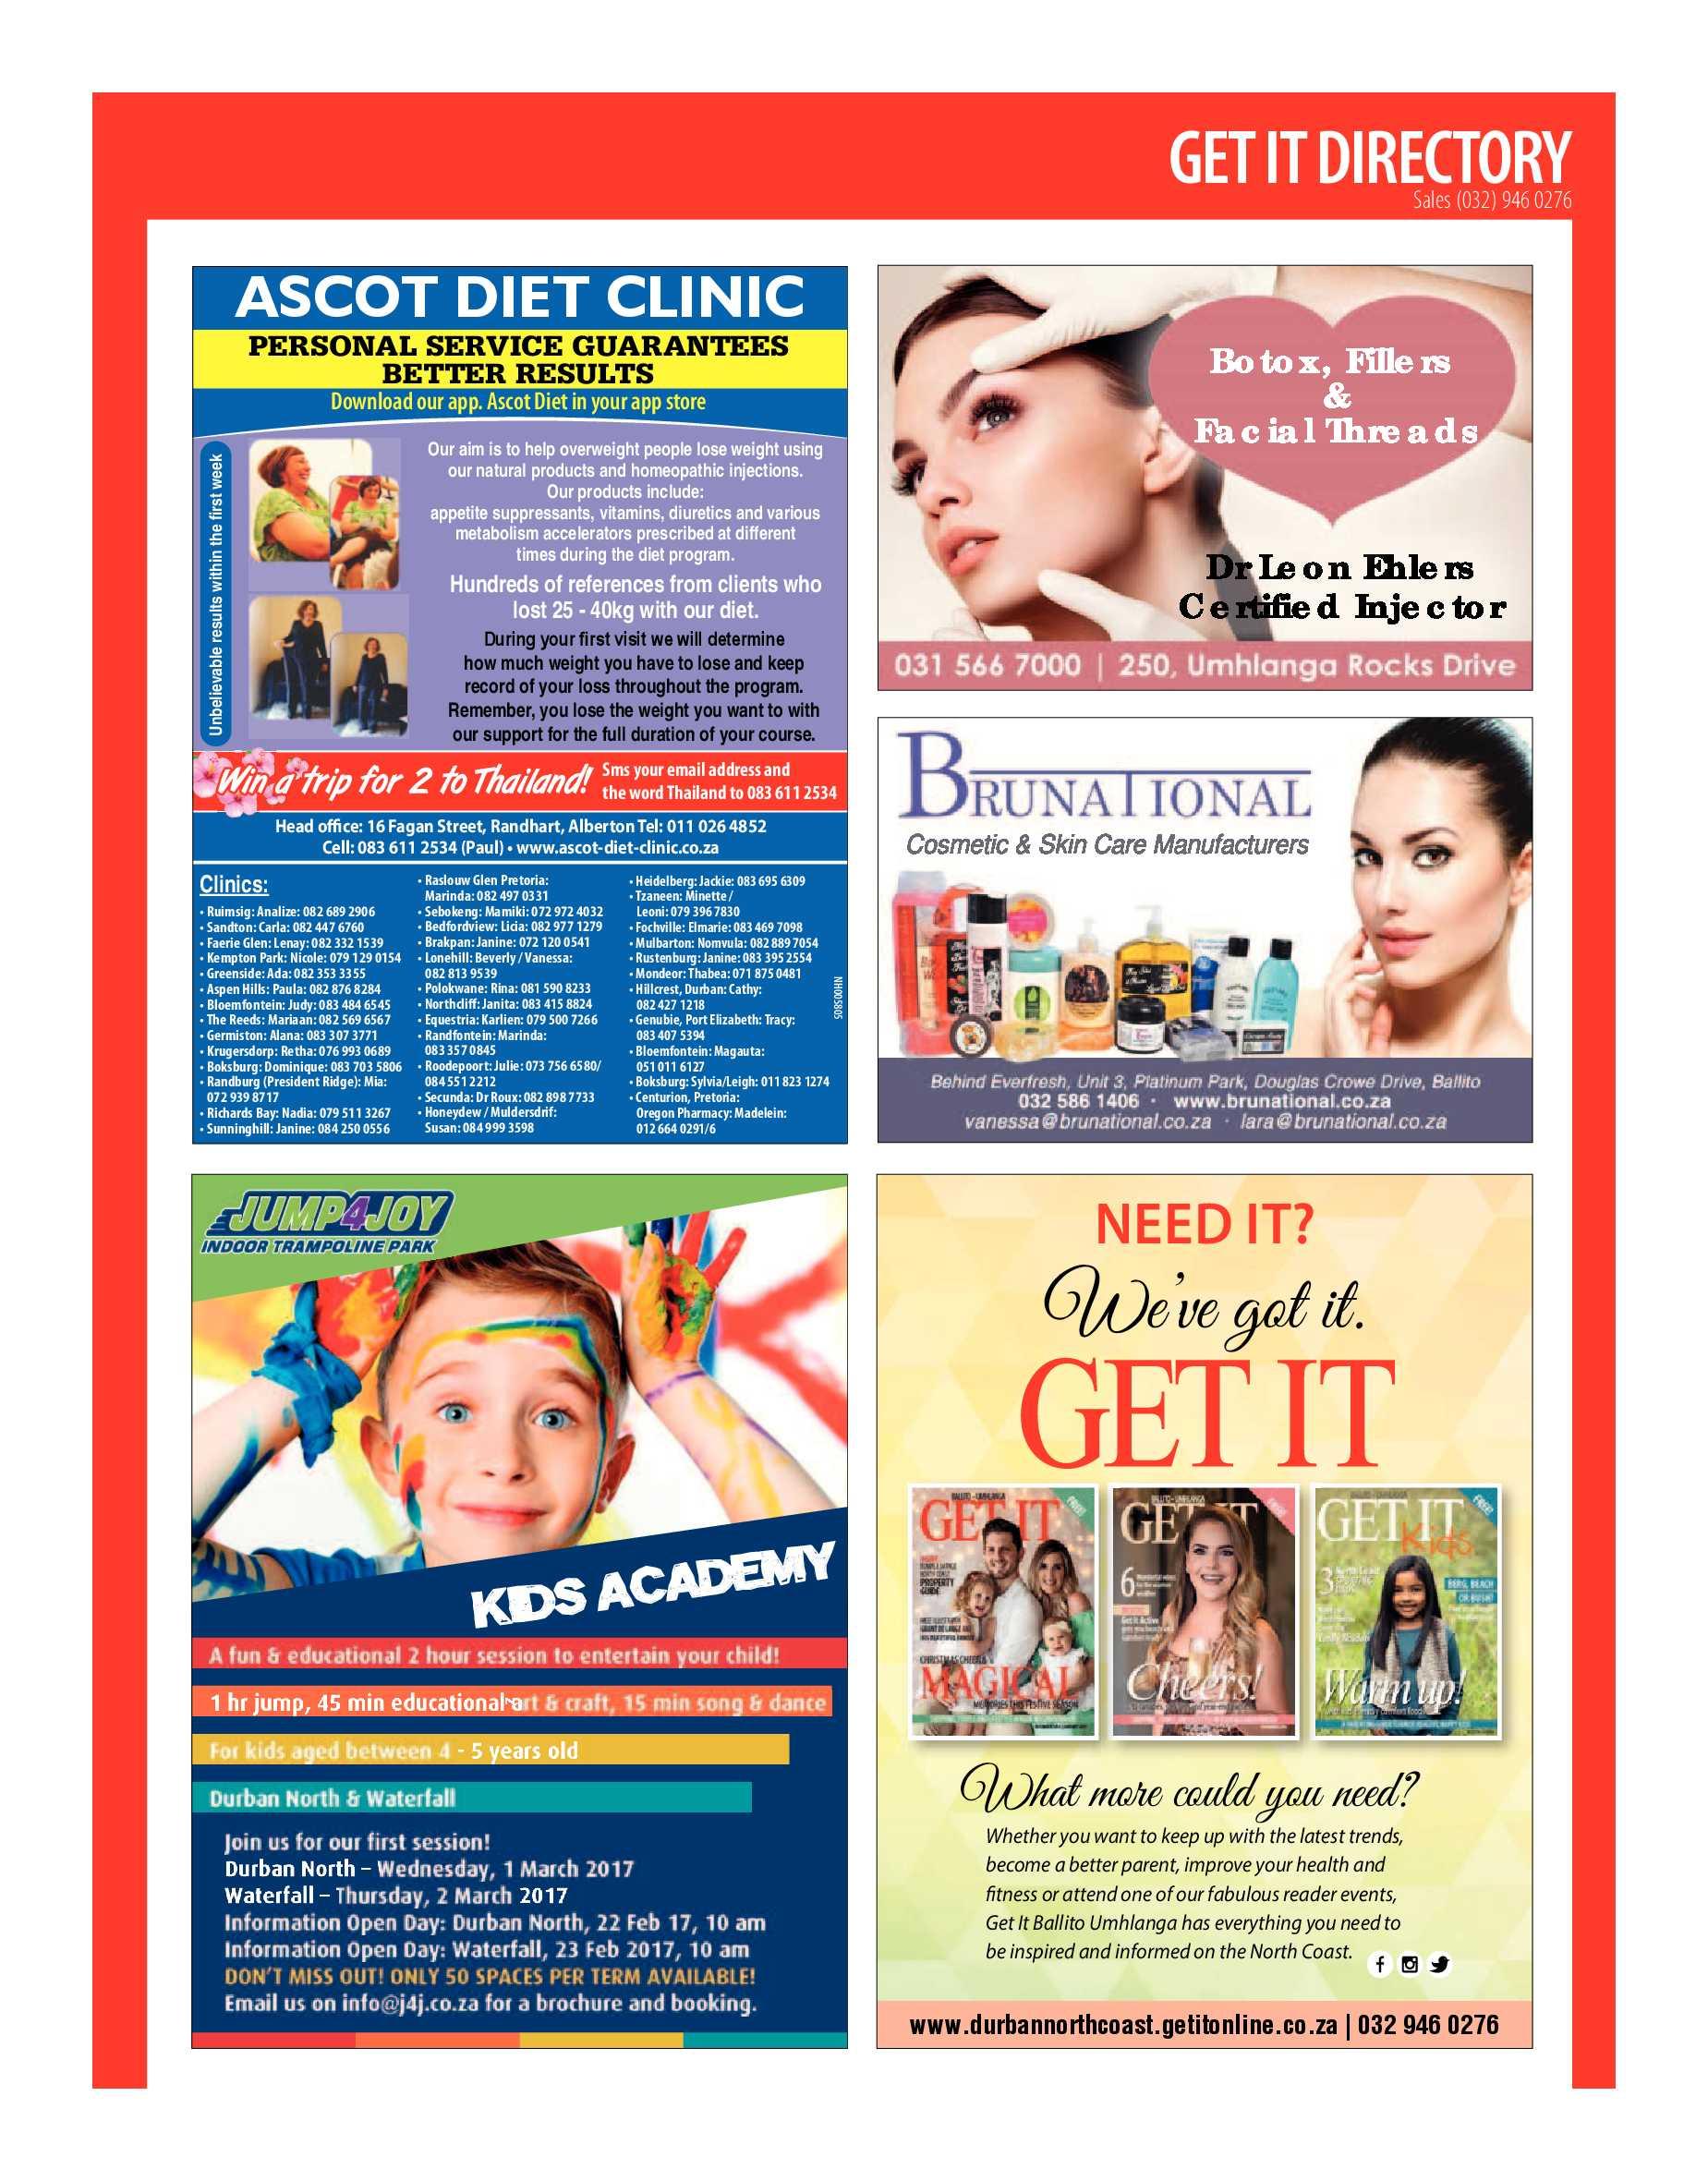 get-magazine-ballitoumhlanga-march-2017-epapers-page-53